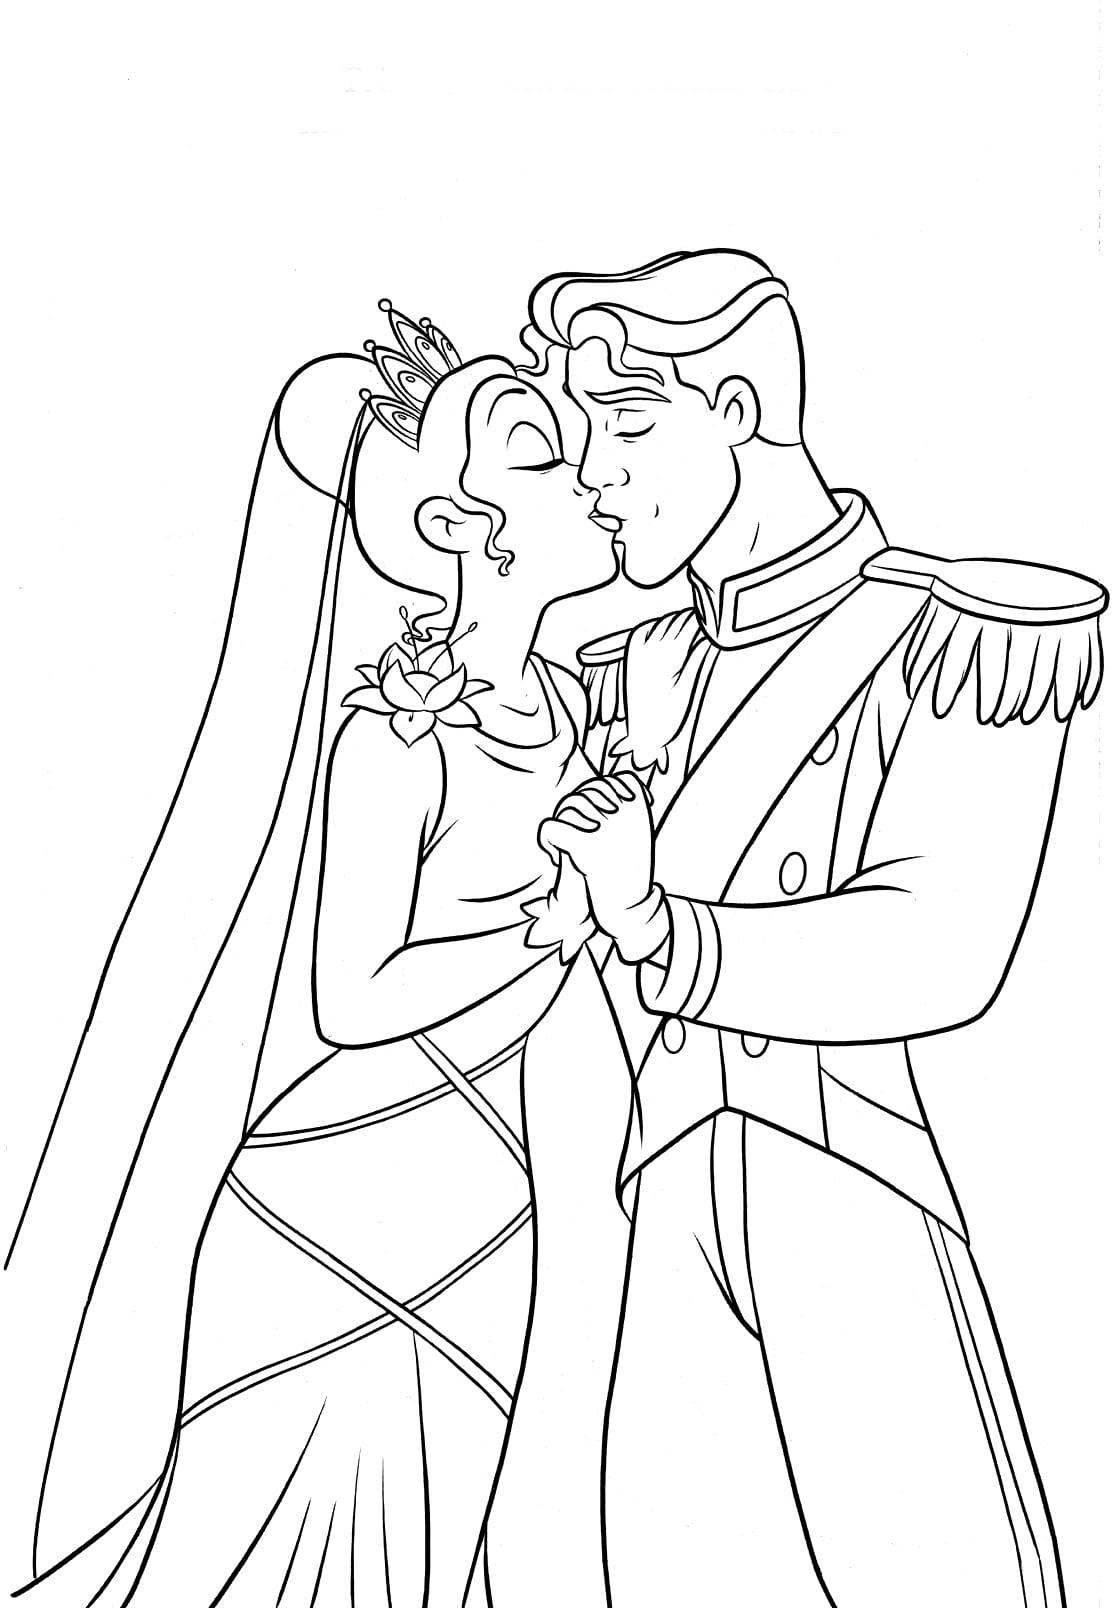 Desenhos De A Princesa E O Sapo Para Colorir